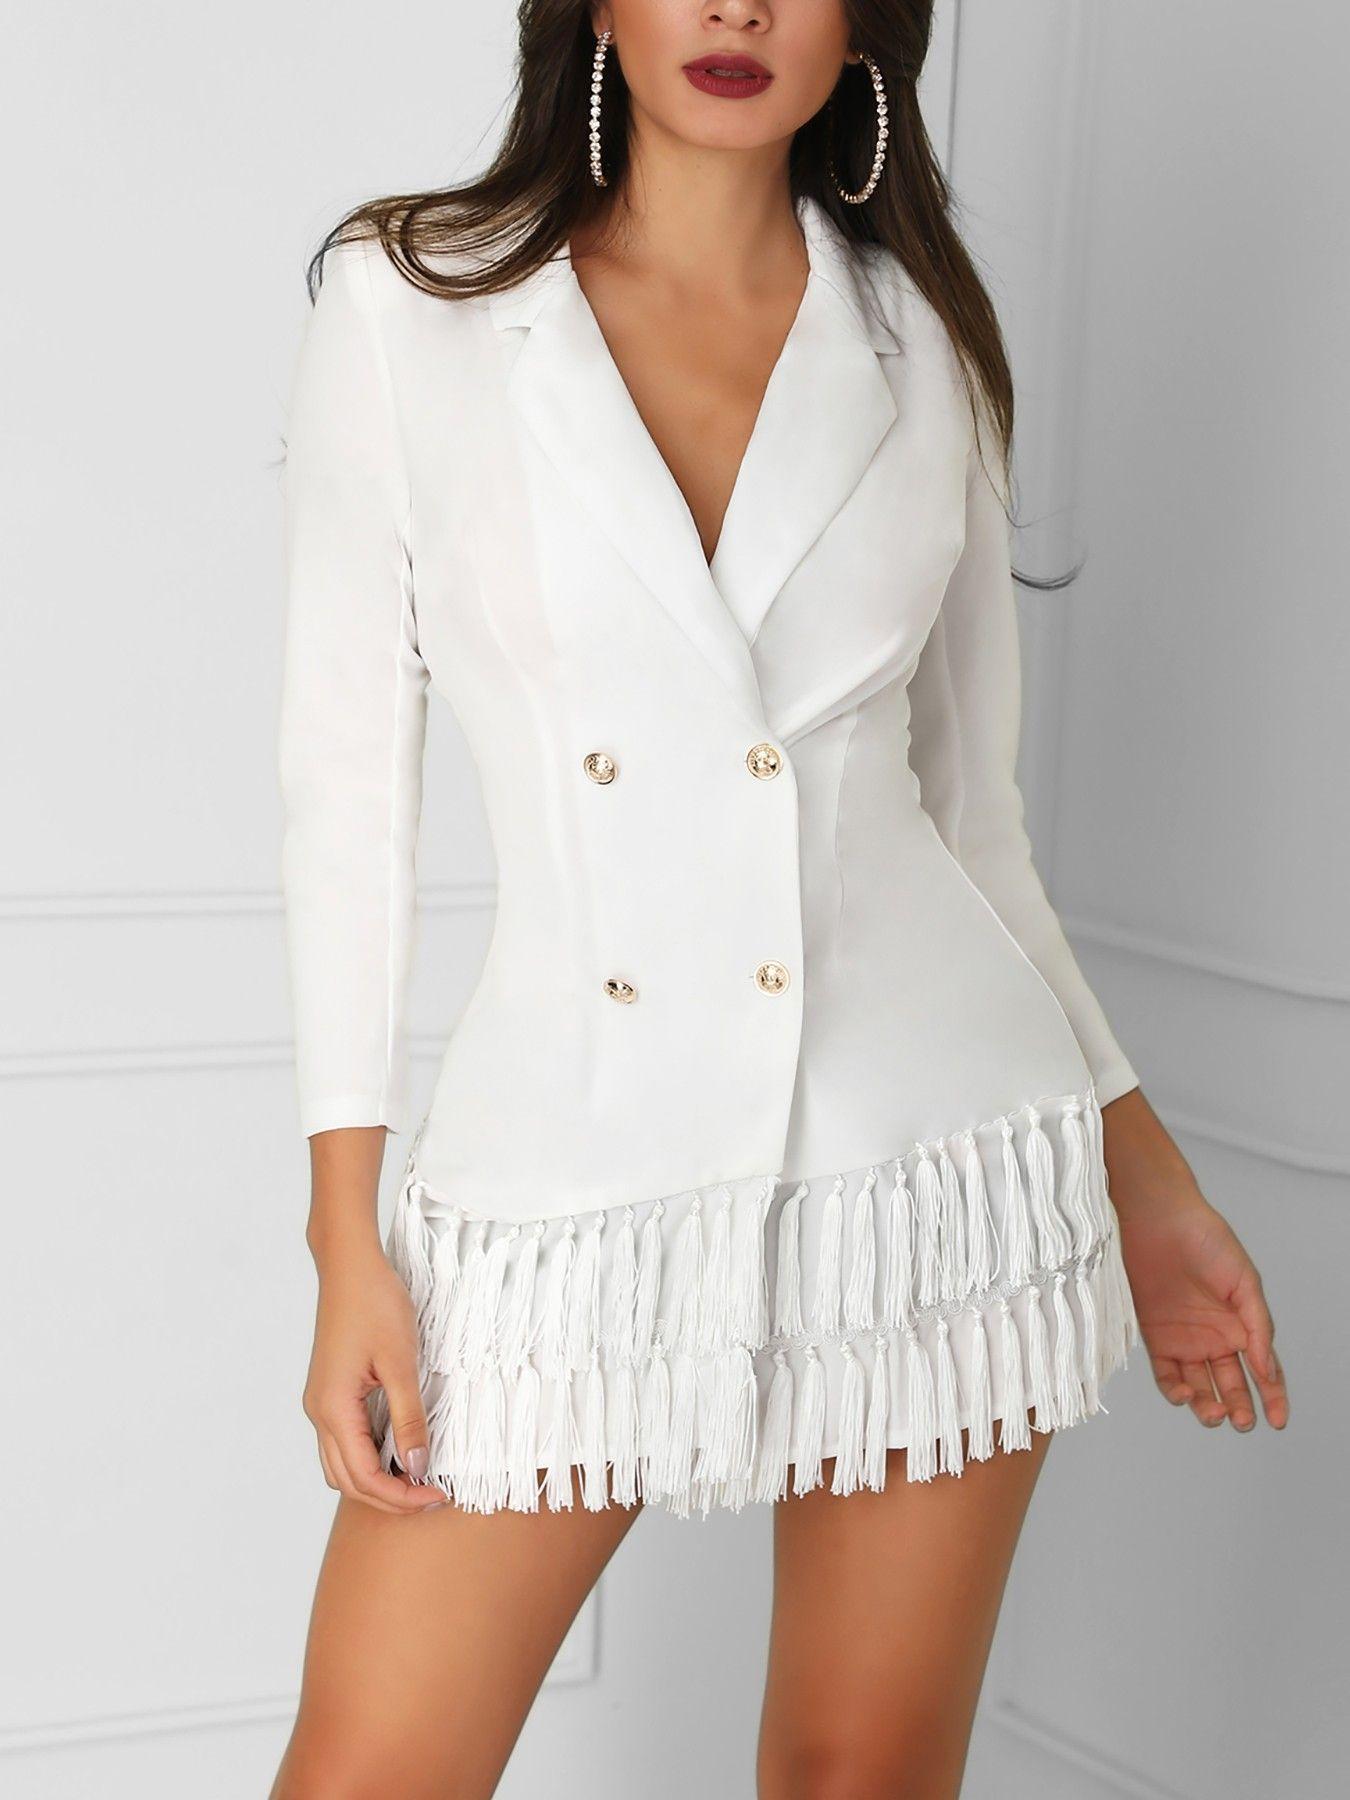 73ccaa0c882f Shop Work Dresses Double-Breasted Tassel Hem Blazer Dress | Stuff to ...